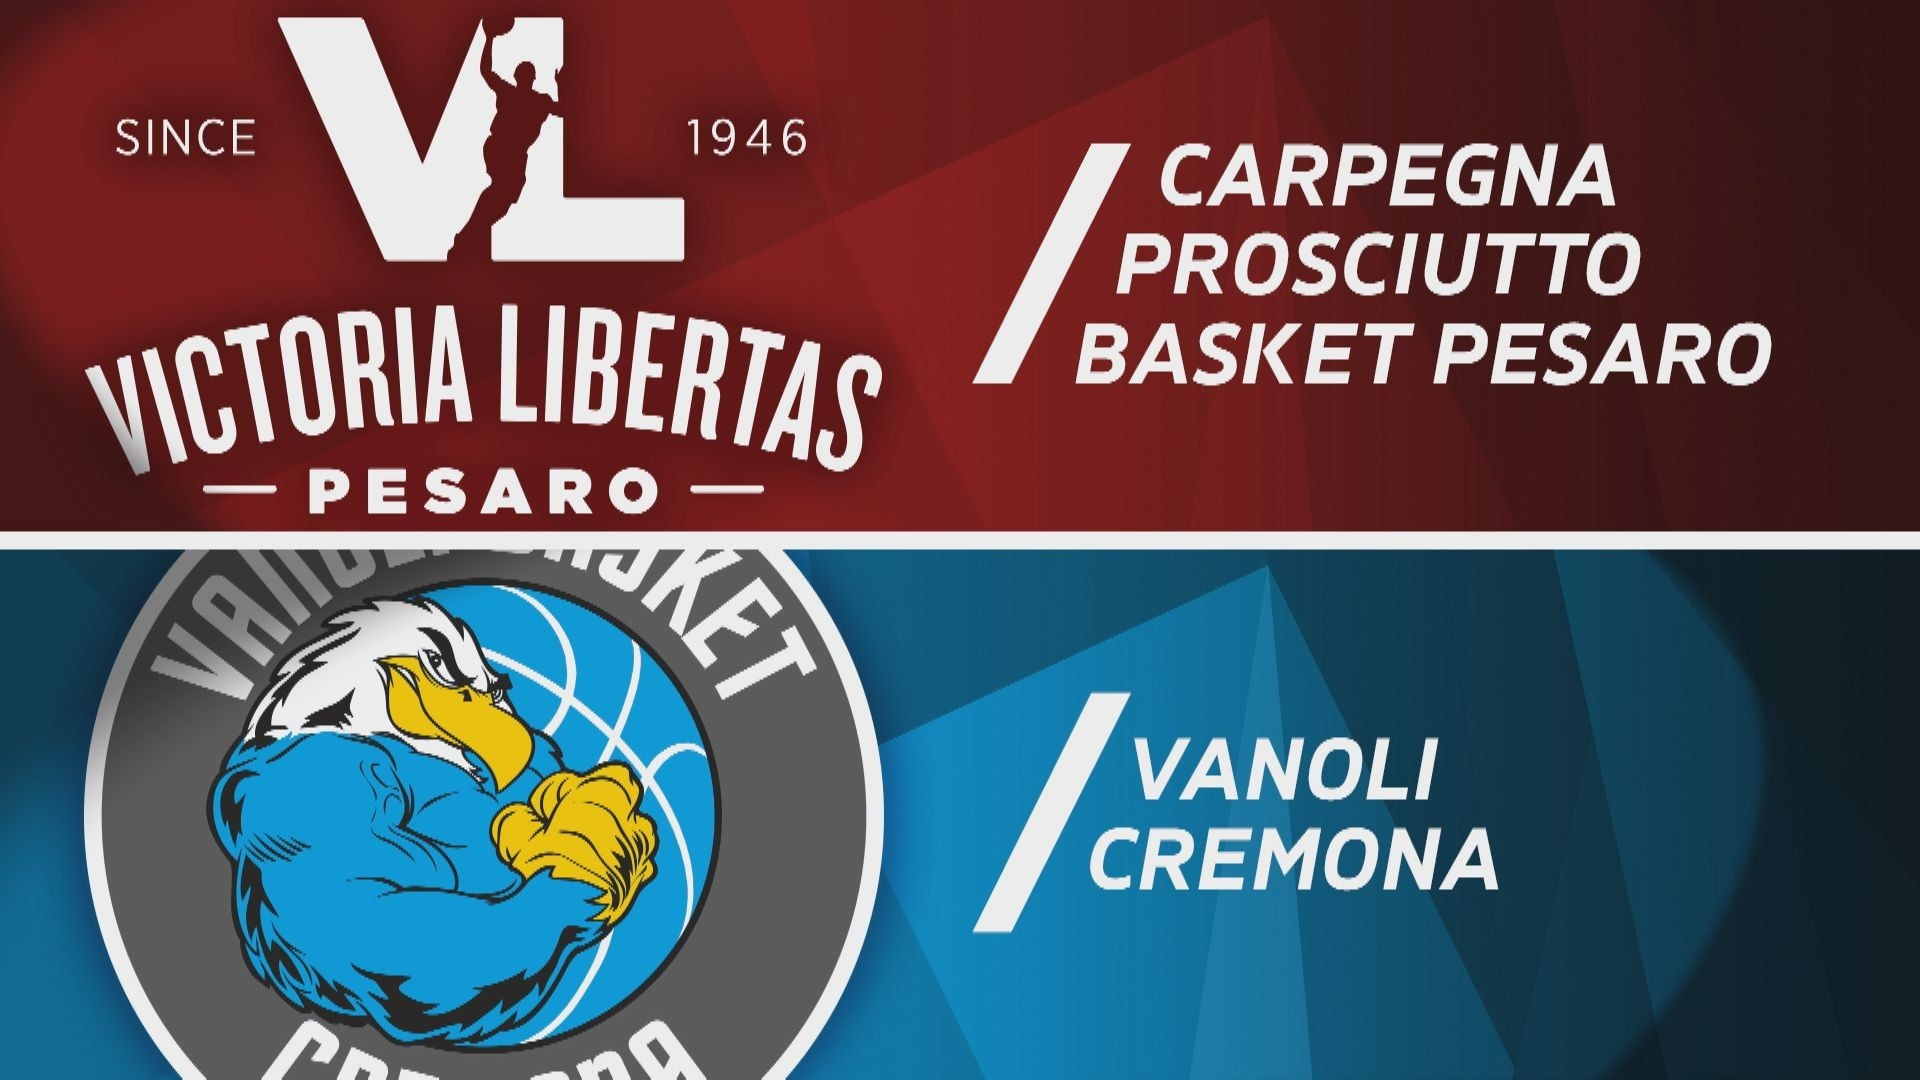 Carpegna Prosciutto Pesaro - Vanoli Basket Cremona 95-83